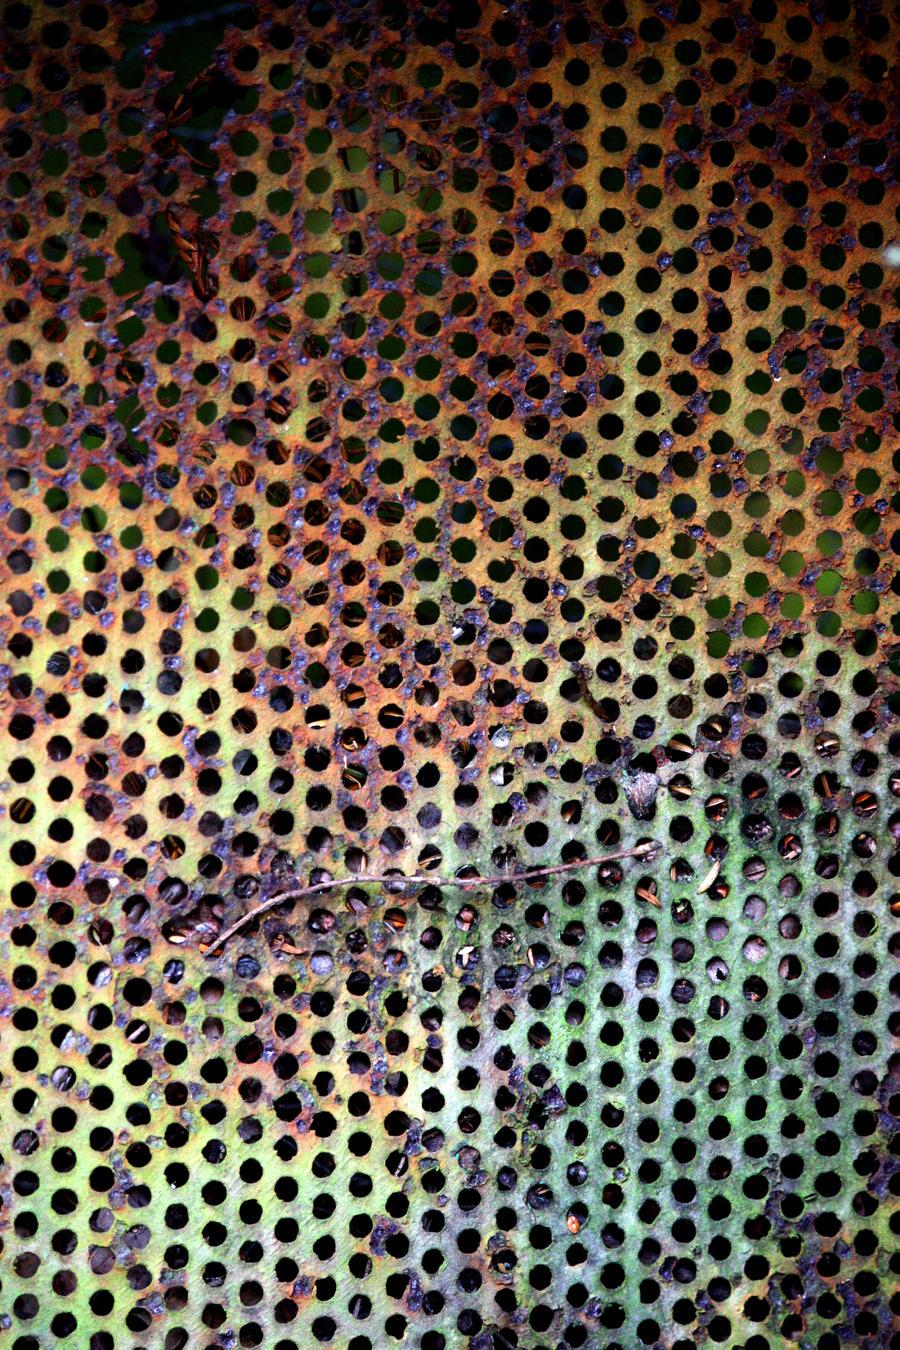 Rusty Perforated Sheet Metal